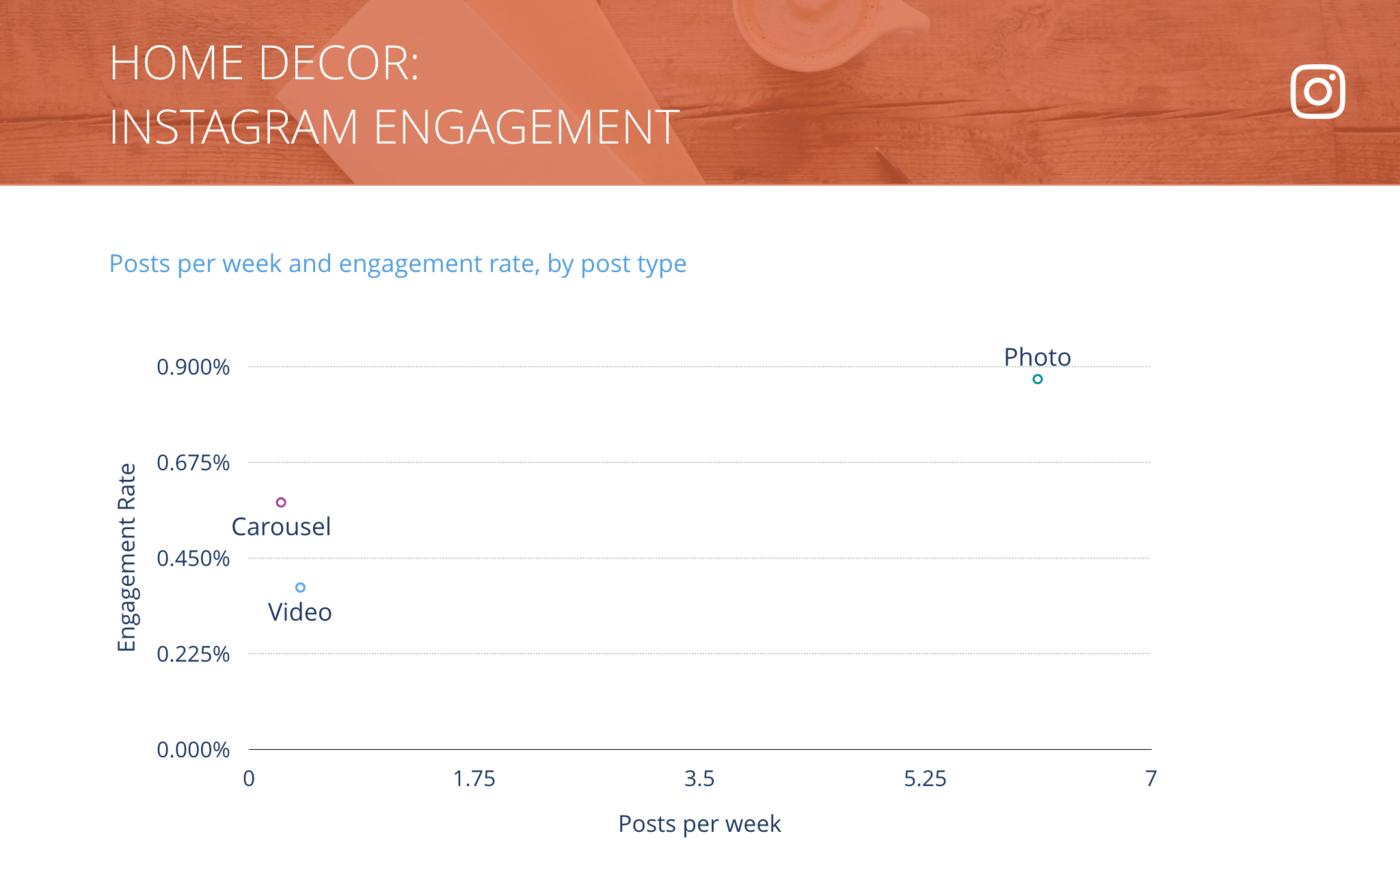 slide for Instagram Posts per Week vs. Engagement Rate per Post, Home Decor